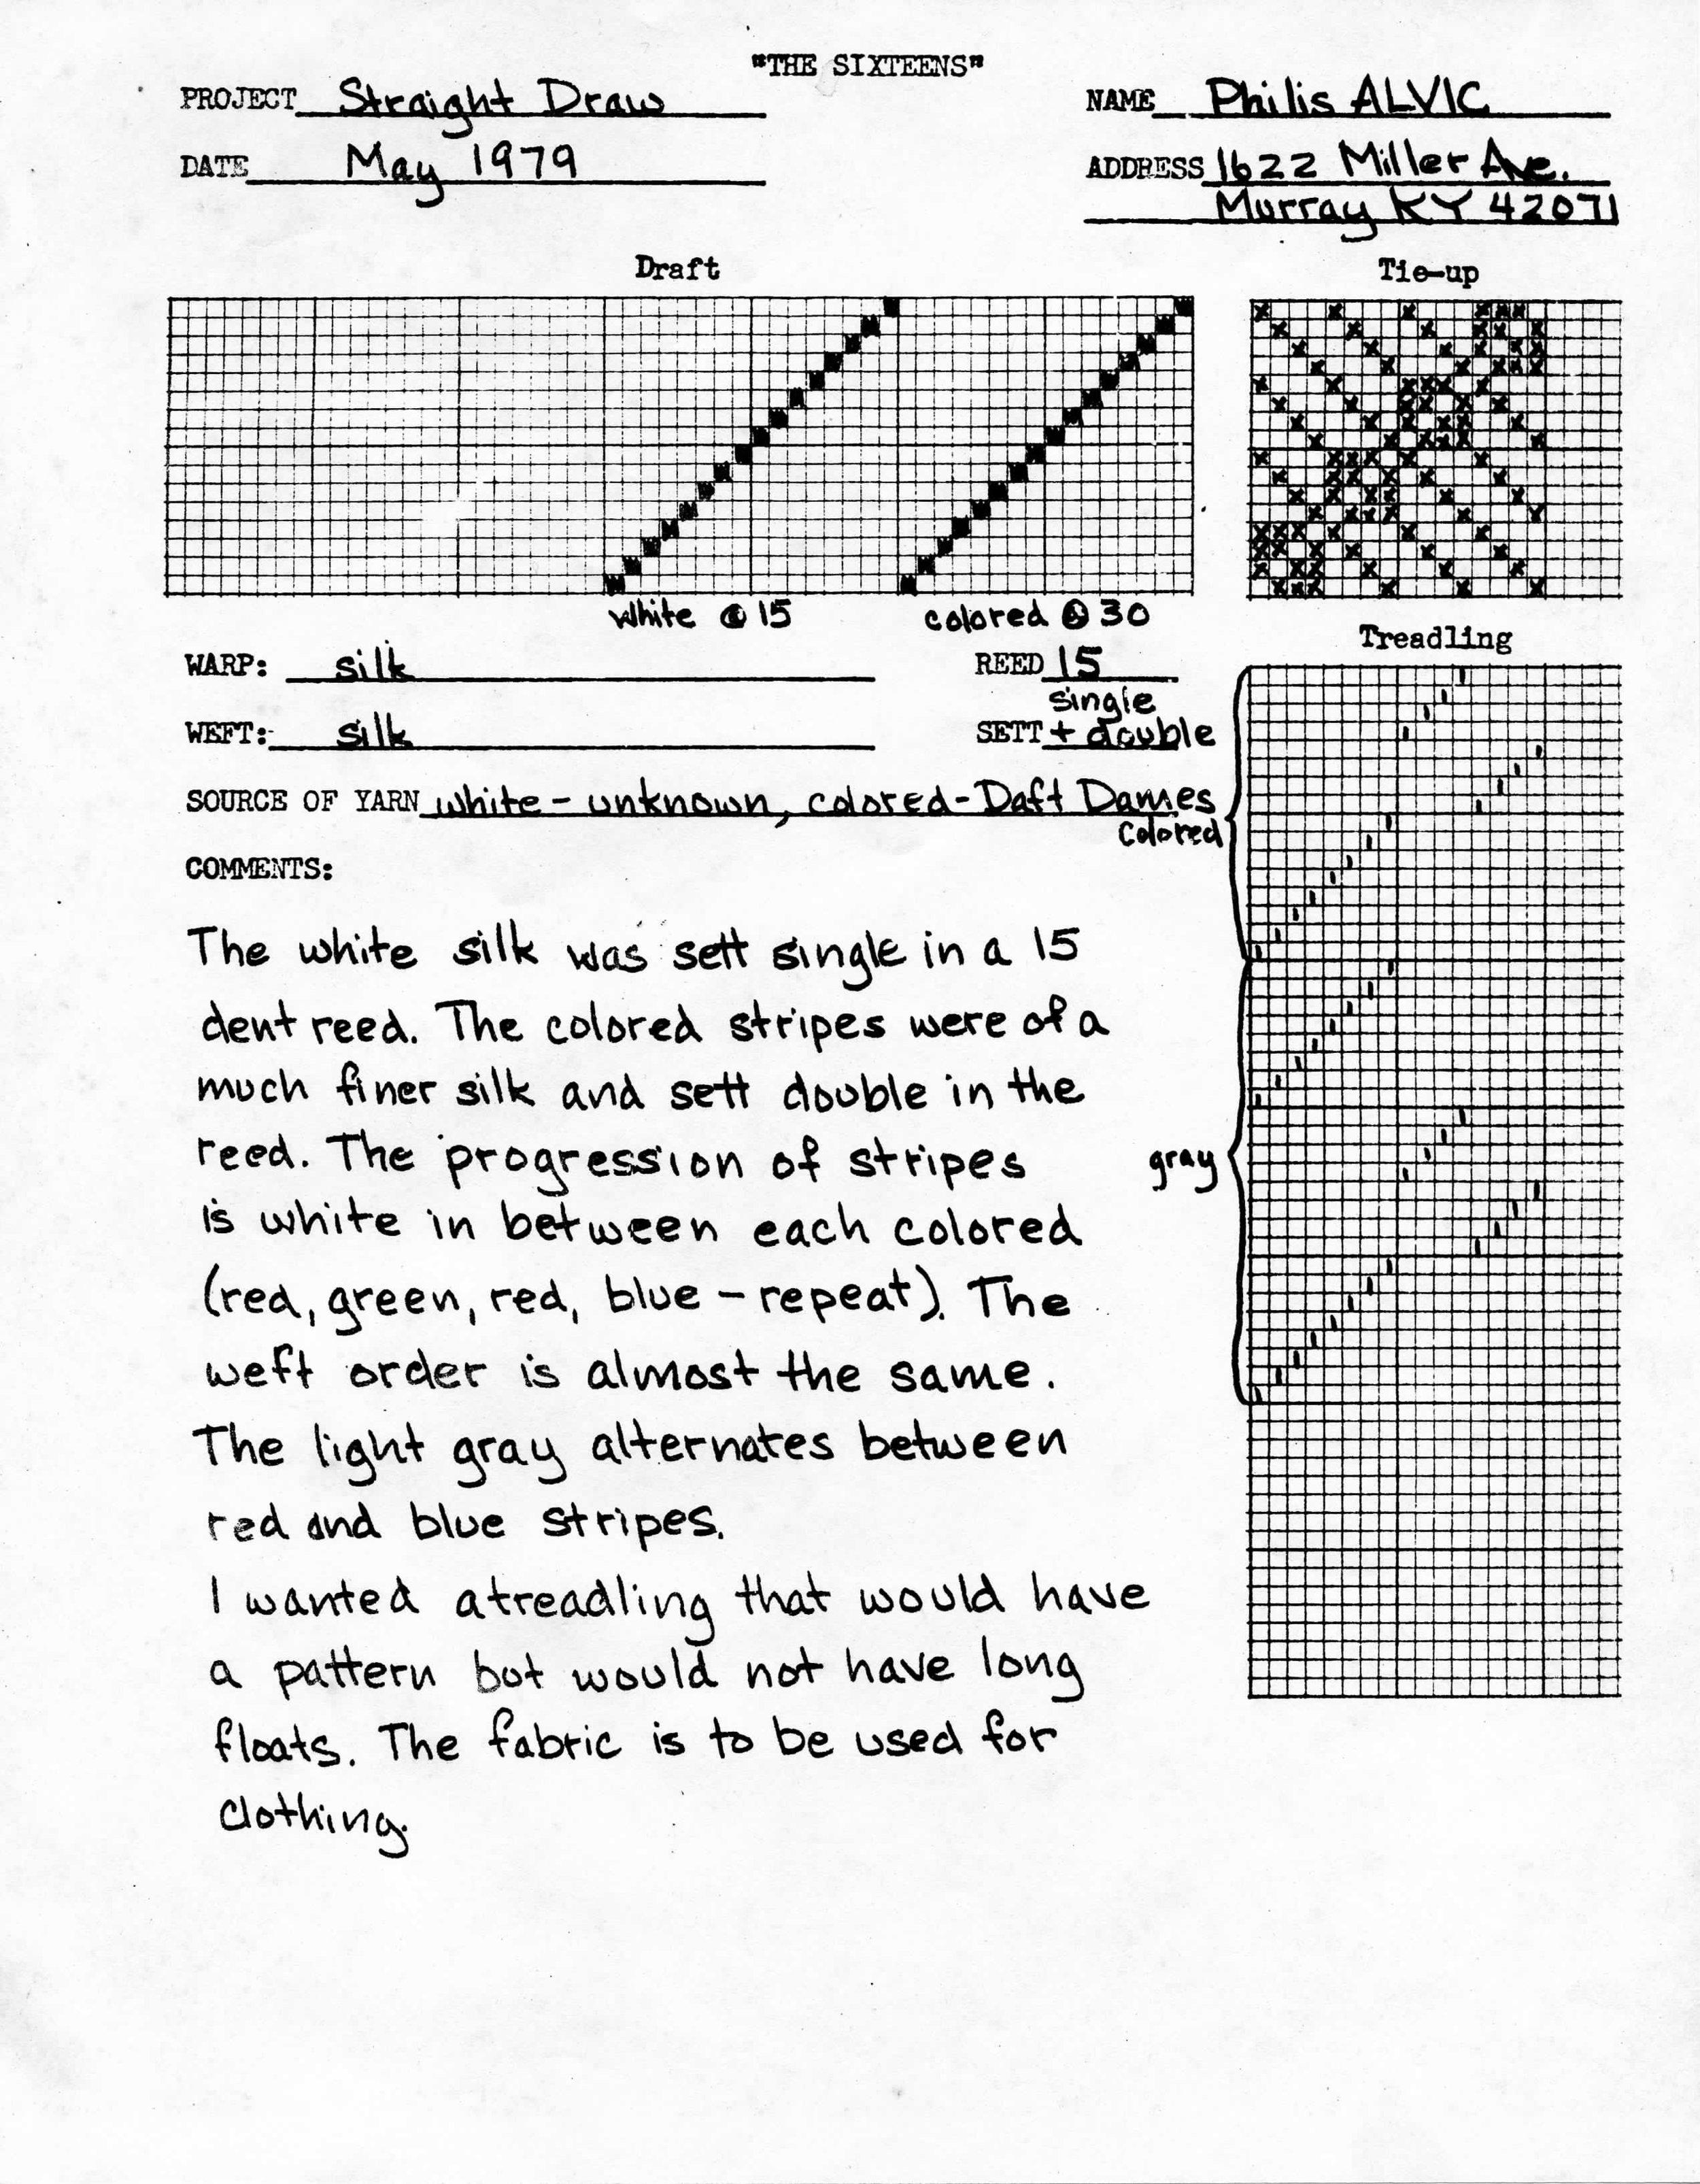 1979_Page_1_Image_0001.jpg